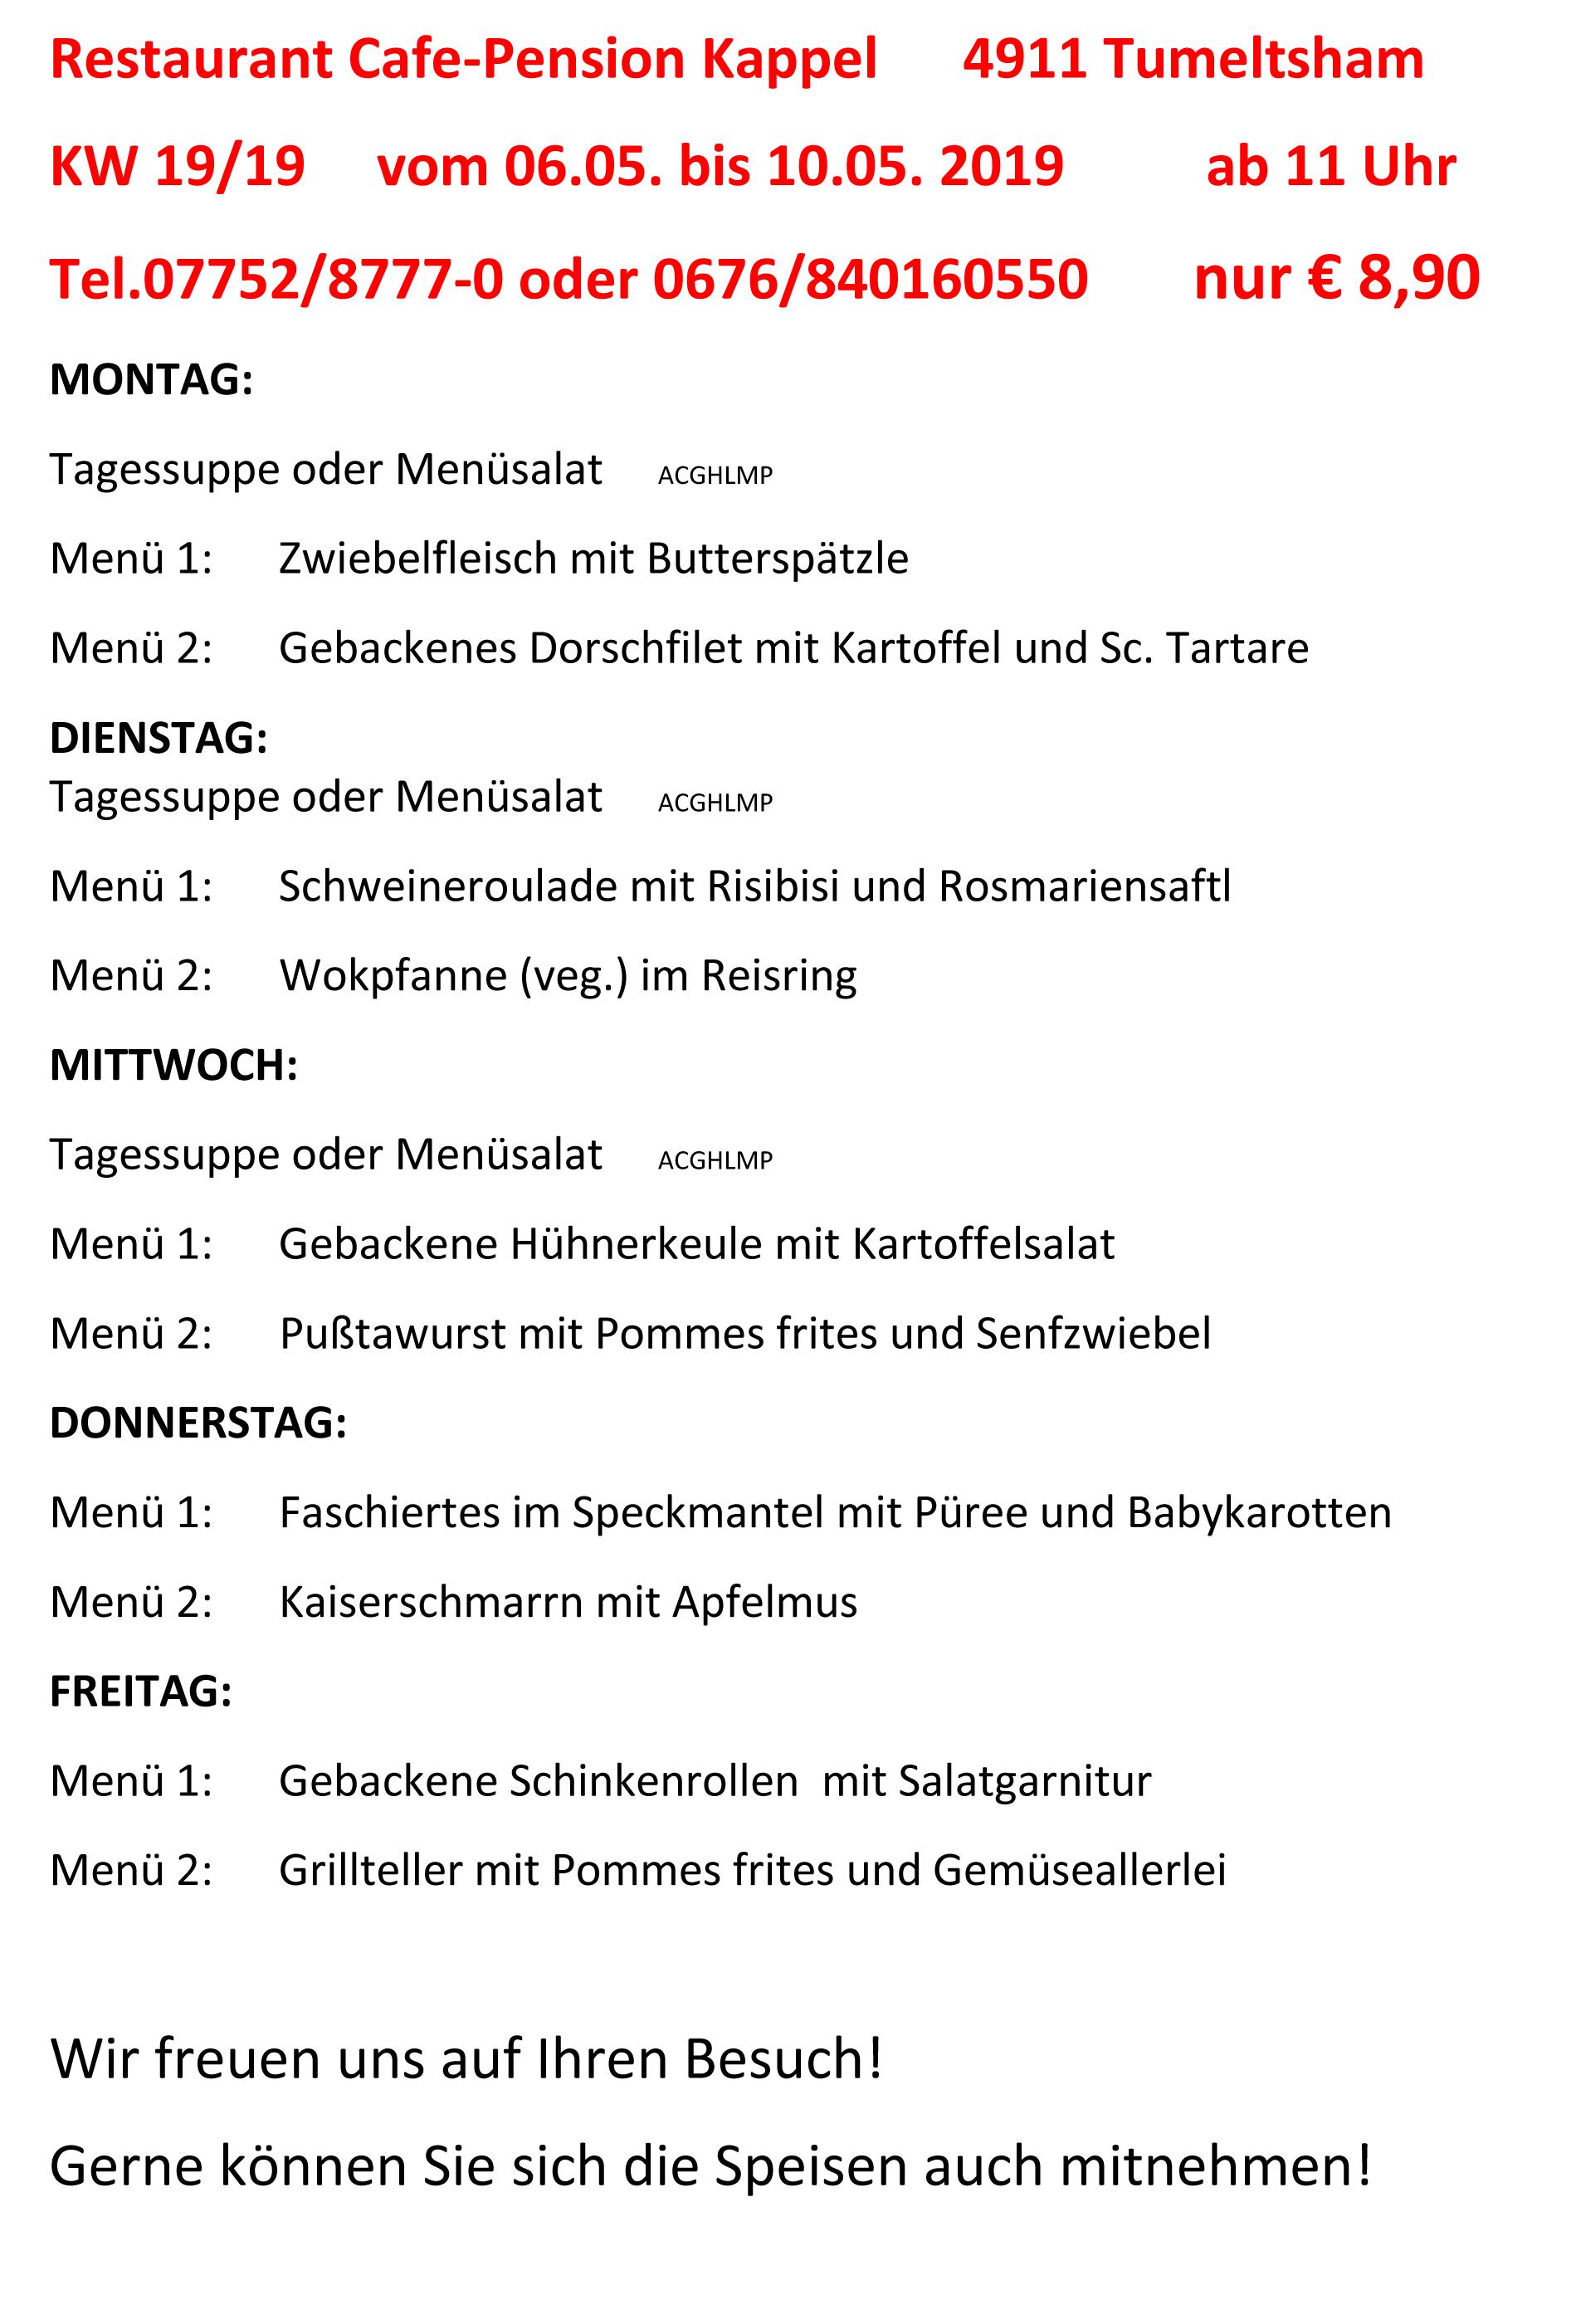 Menüplan KW 19- 19docx (1)